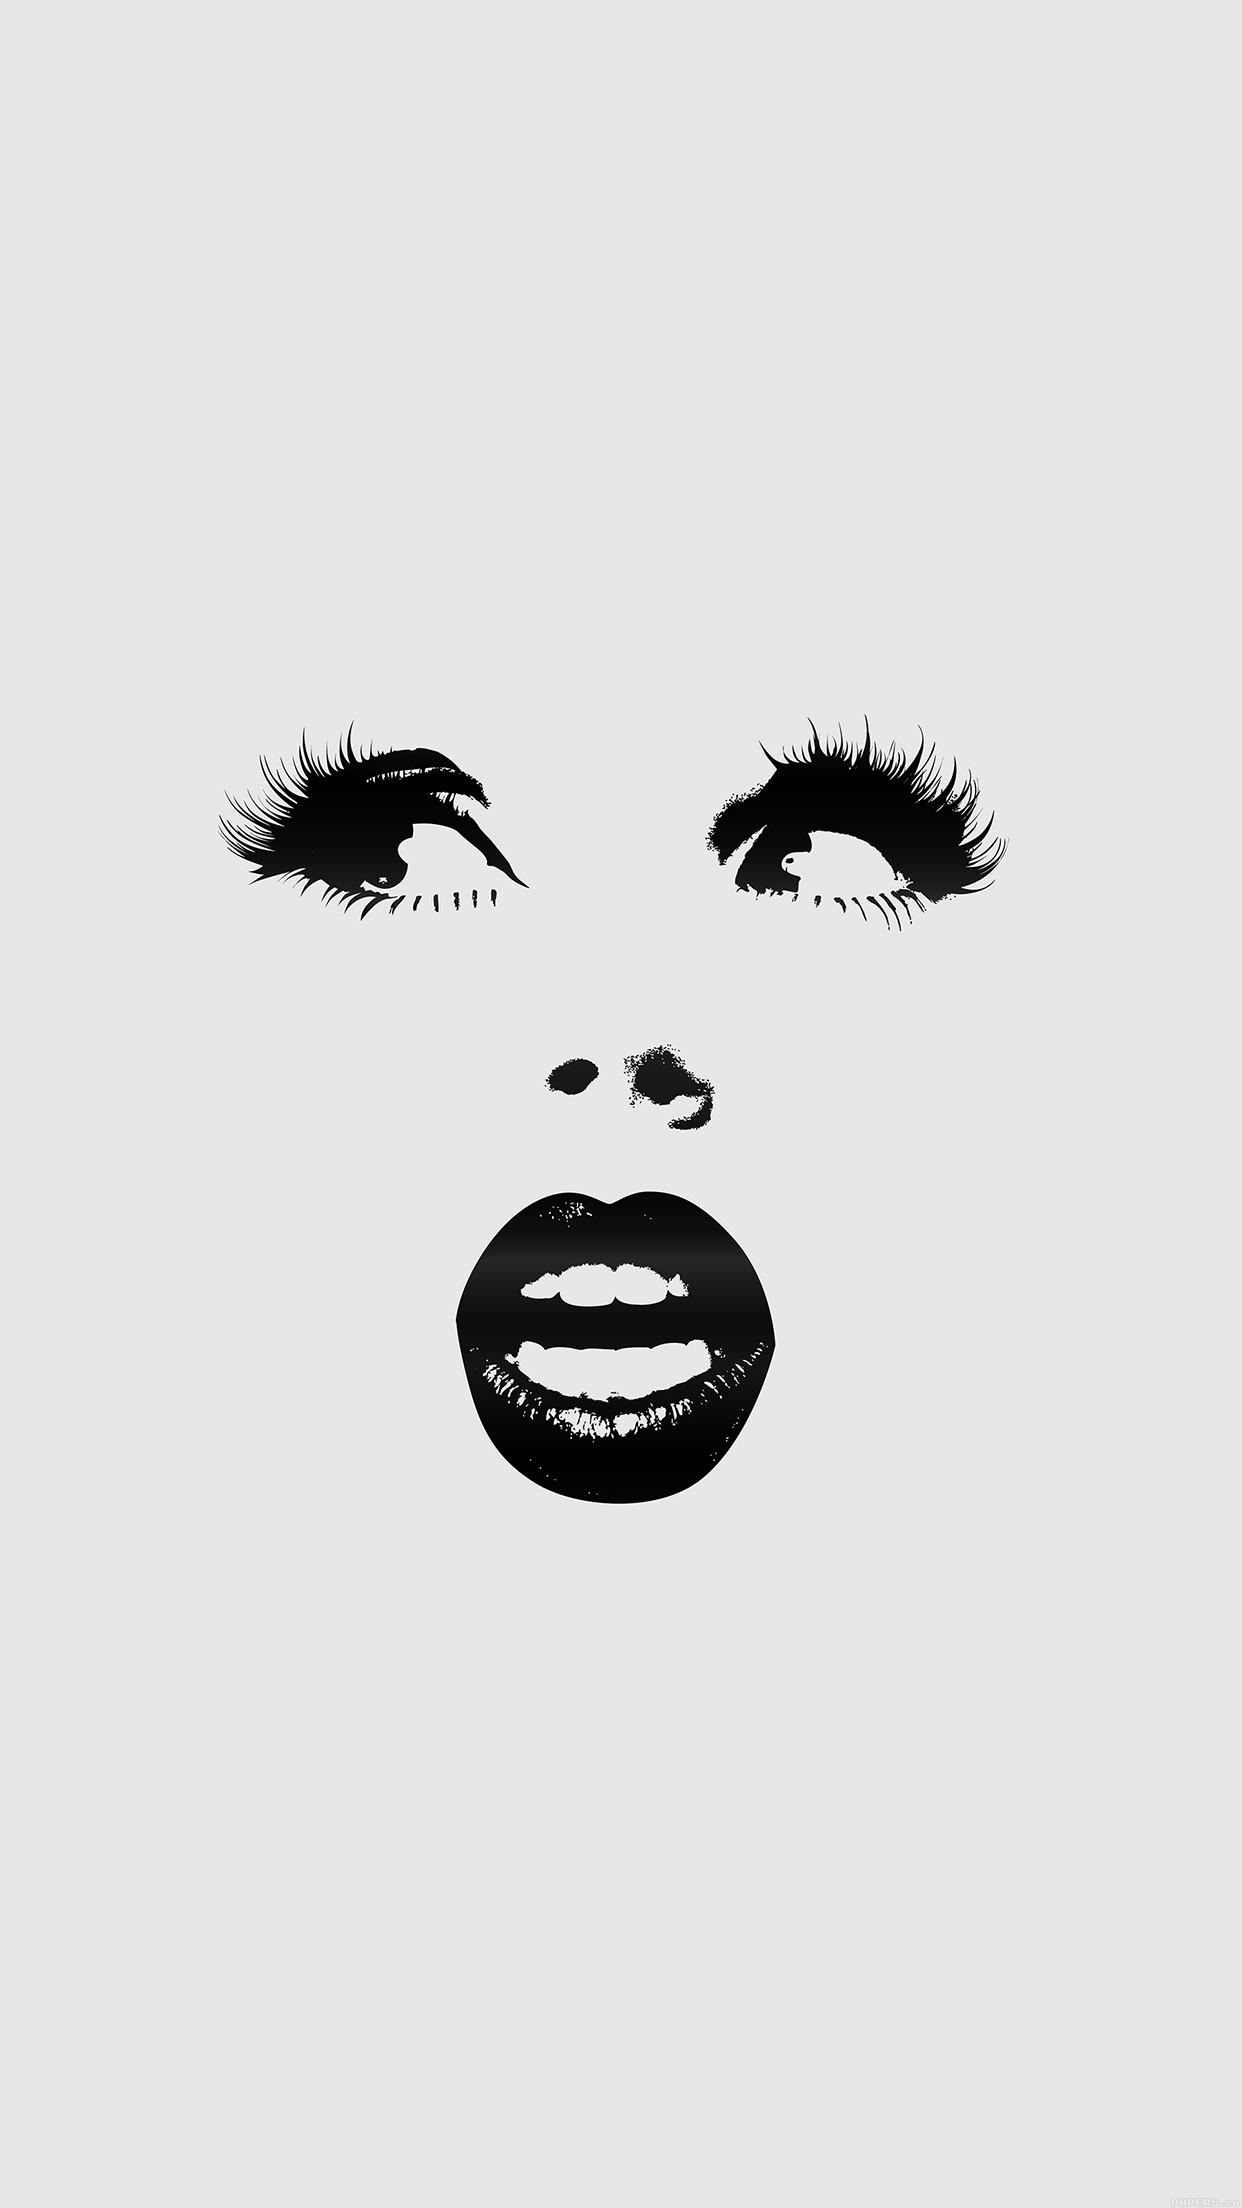 Girlish Girly Face Lips Eyes Minimalistic Stylish Girl Black and White HD  iPhone 6 plus Wallpaper